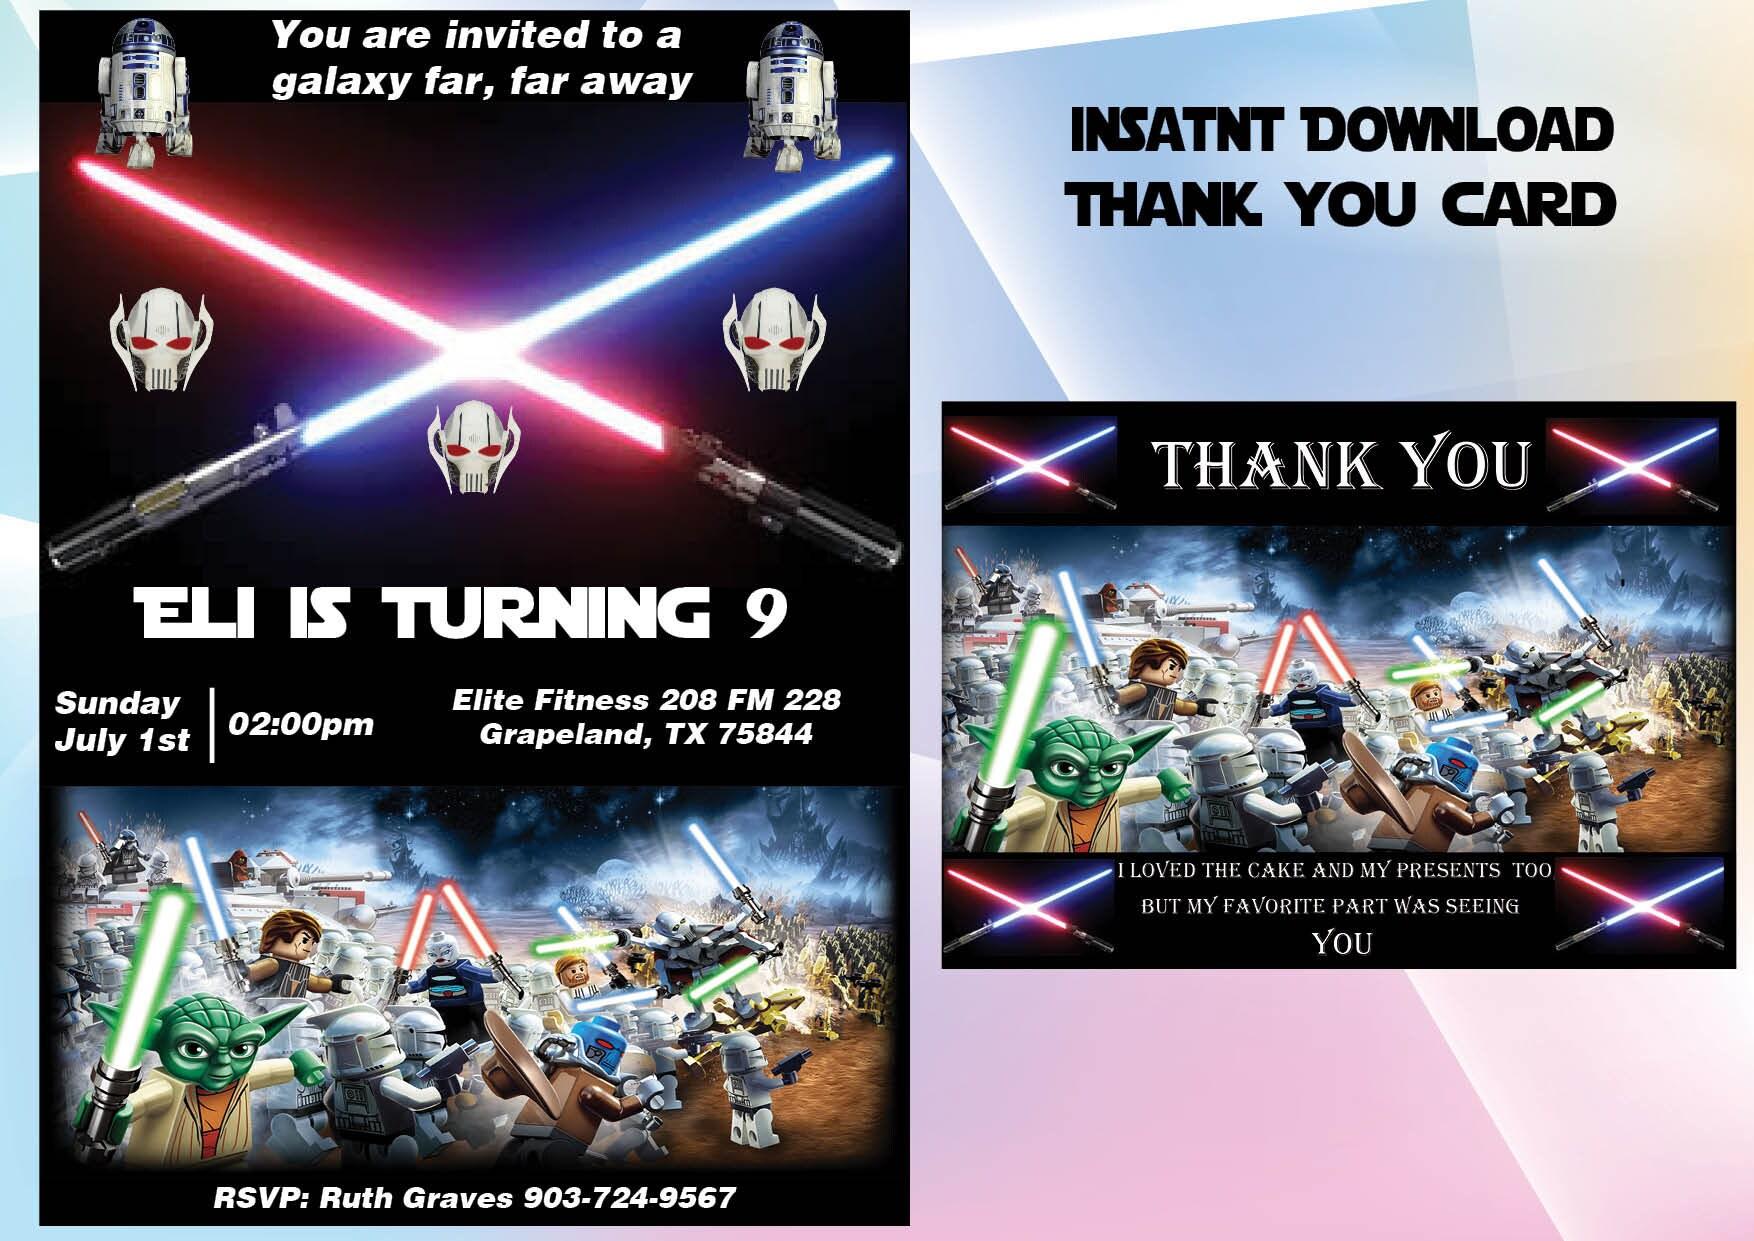 Lego Star Wars invitation thank you card Star Wars